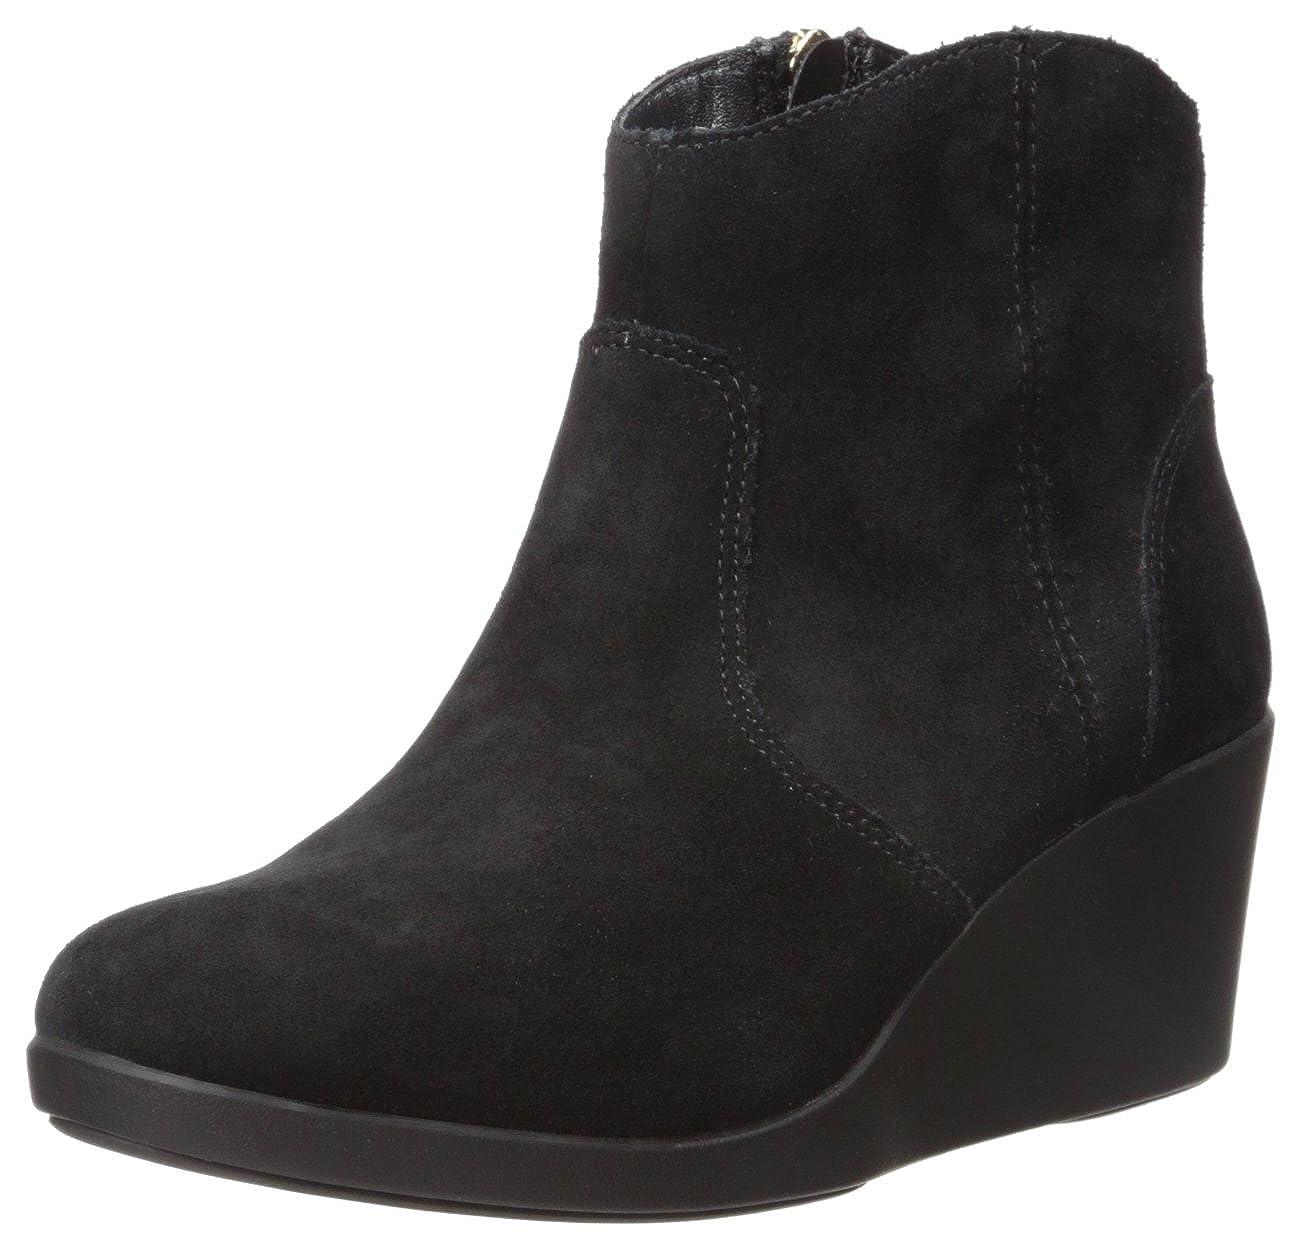 Crocs Leigh Suede Wedge Bootie - Black